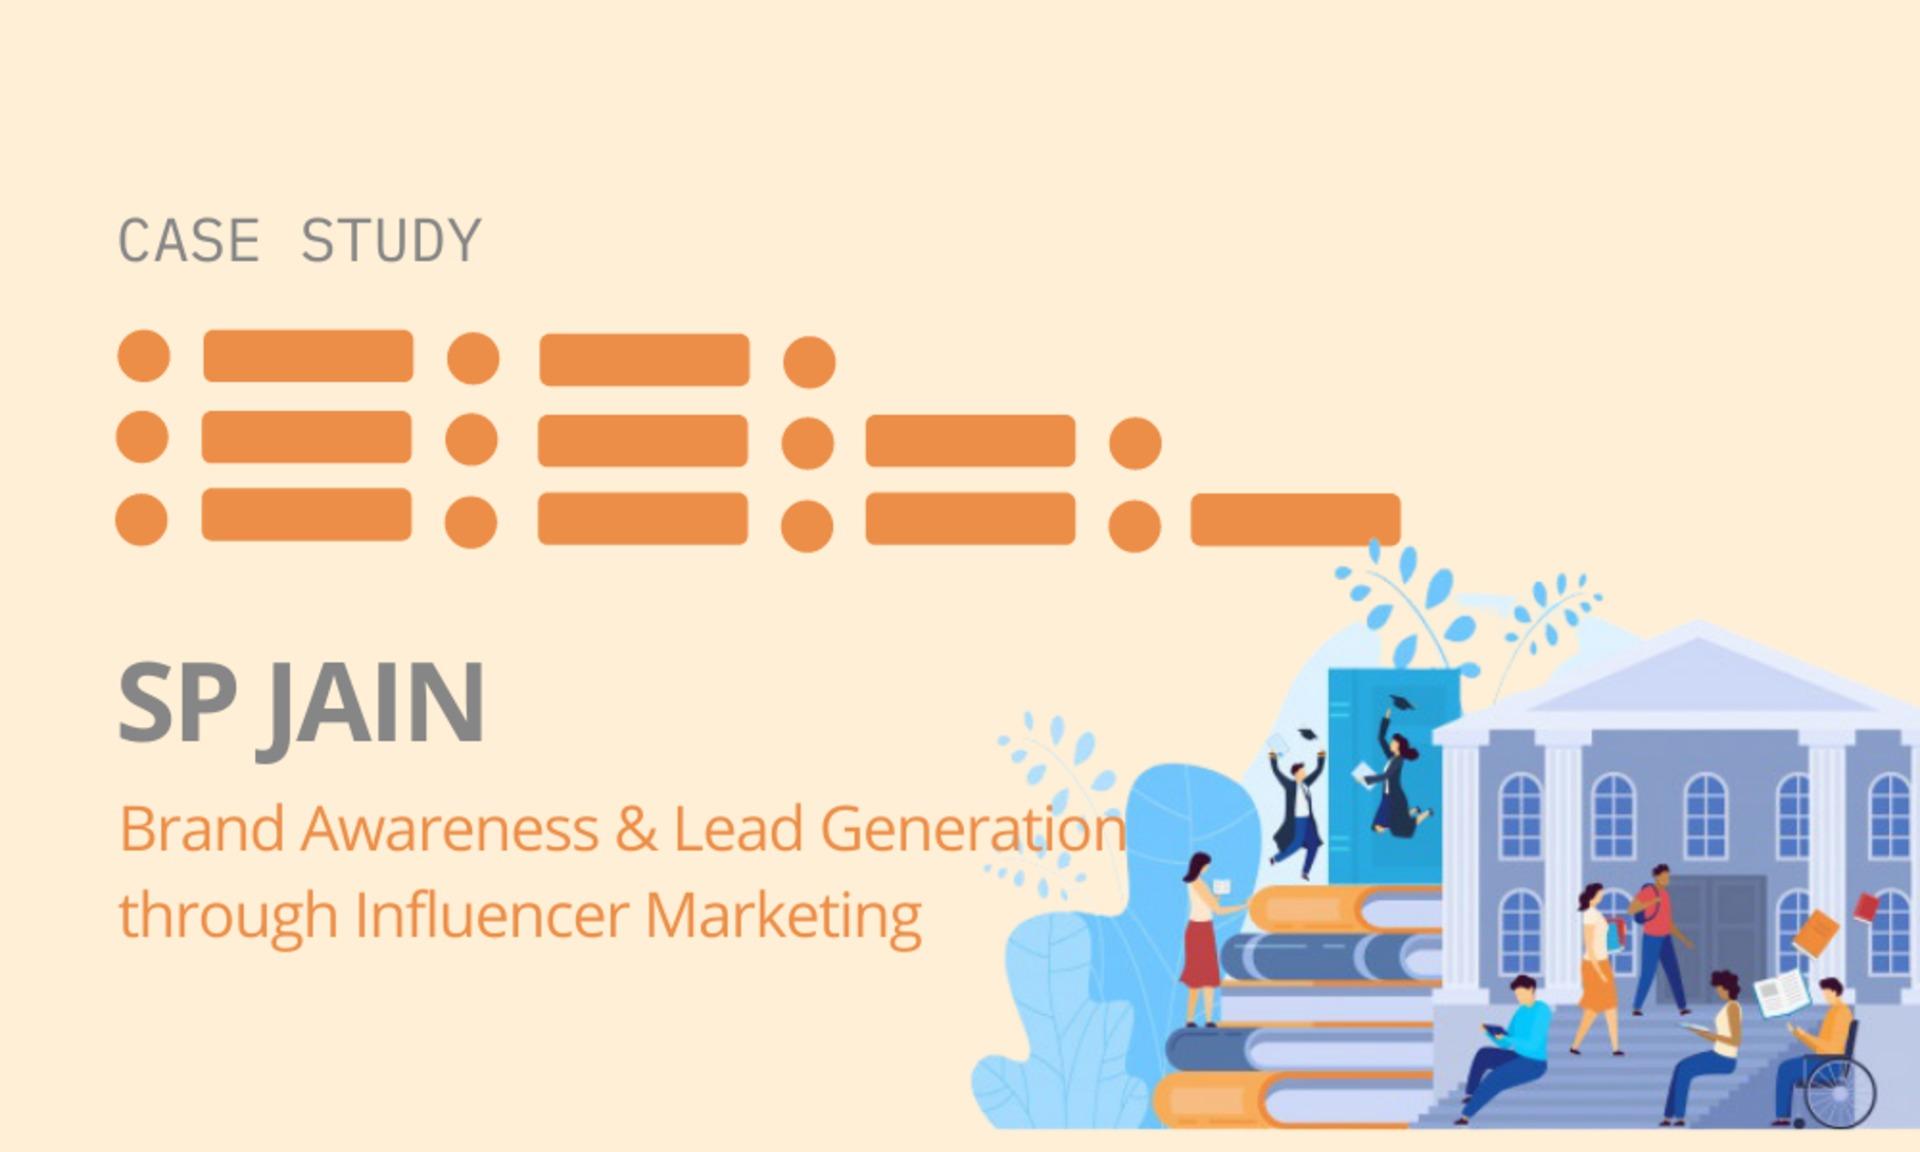 SP Jain: Brand Awareness & Lead Generation through Influencer Marketing image